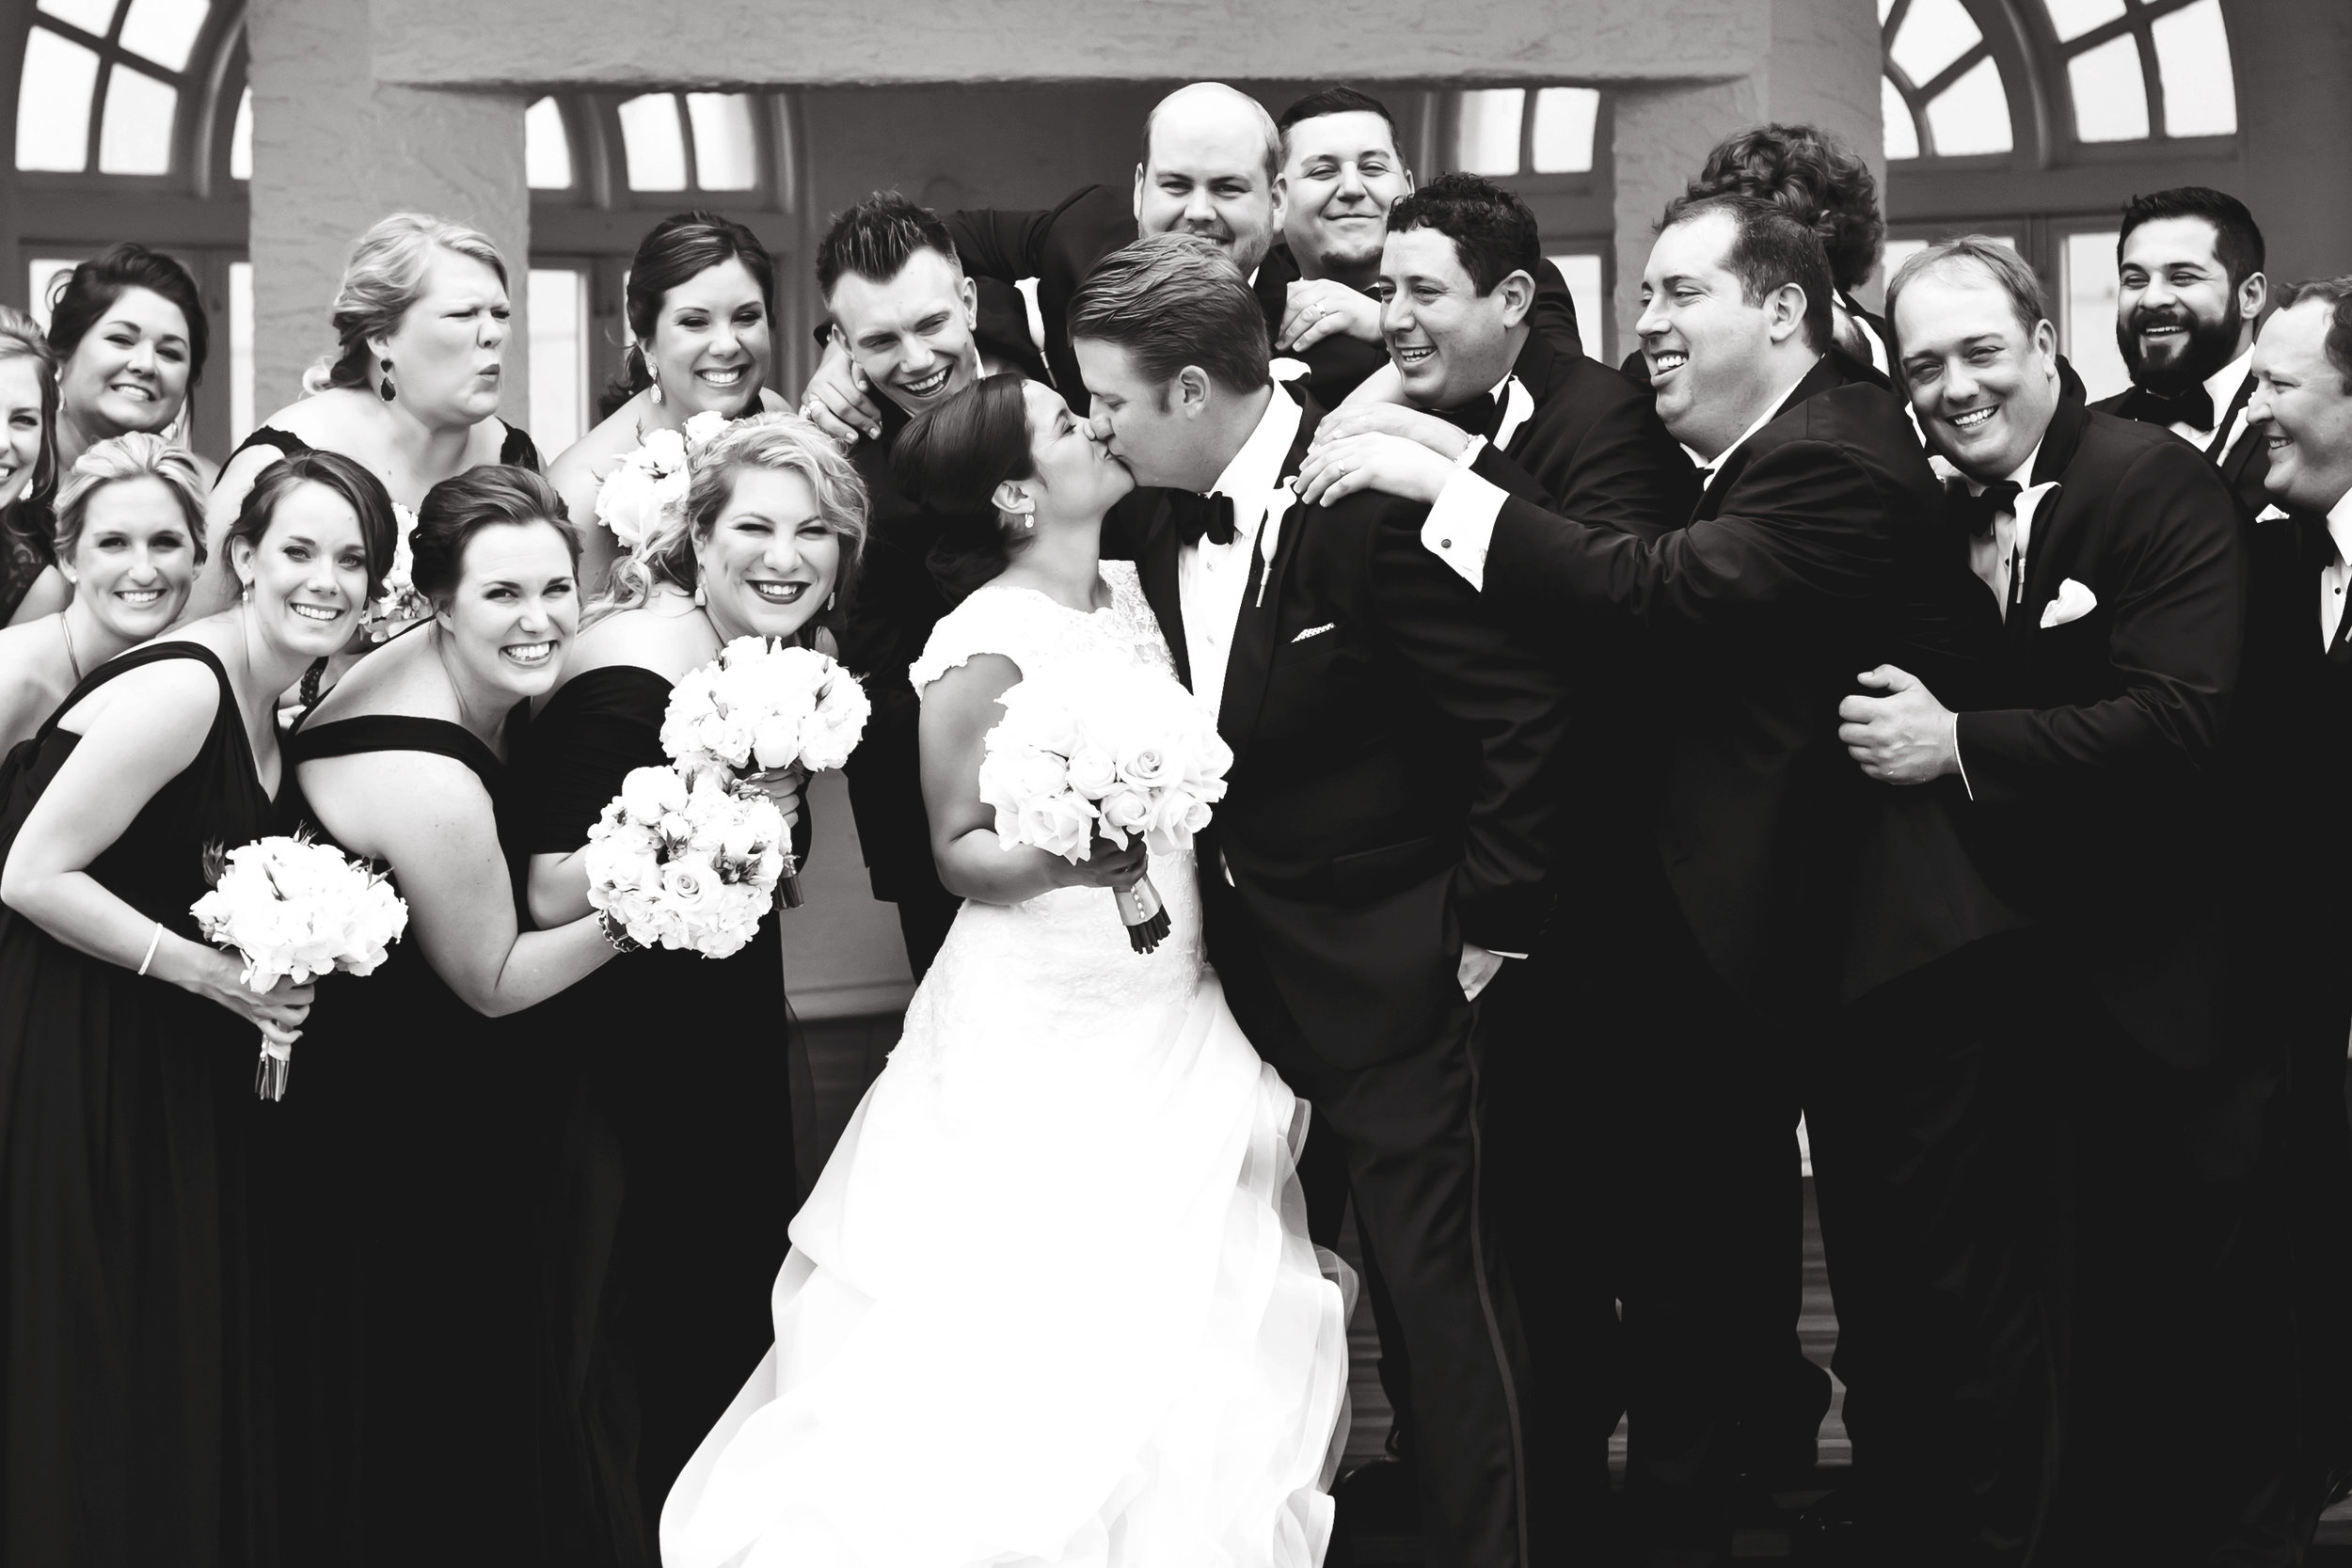 Marble_Falls_Horseshoe_Bay_Photographer_Torres_Wedding_29.jpg